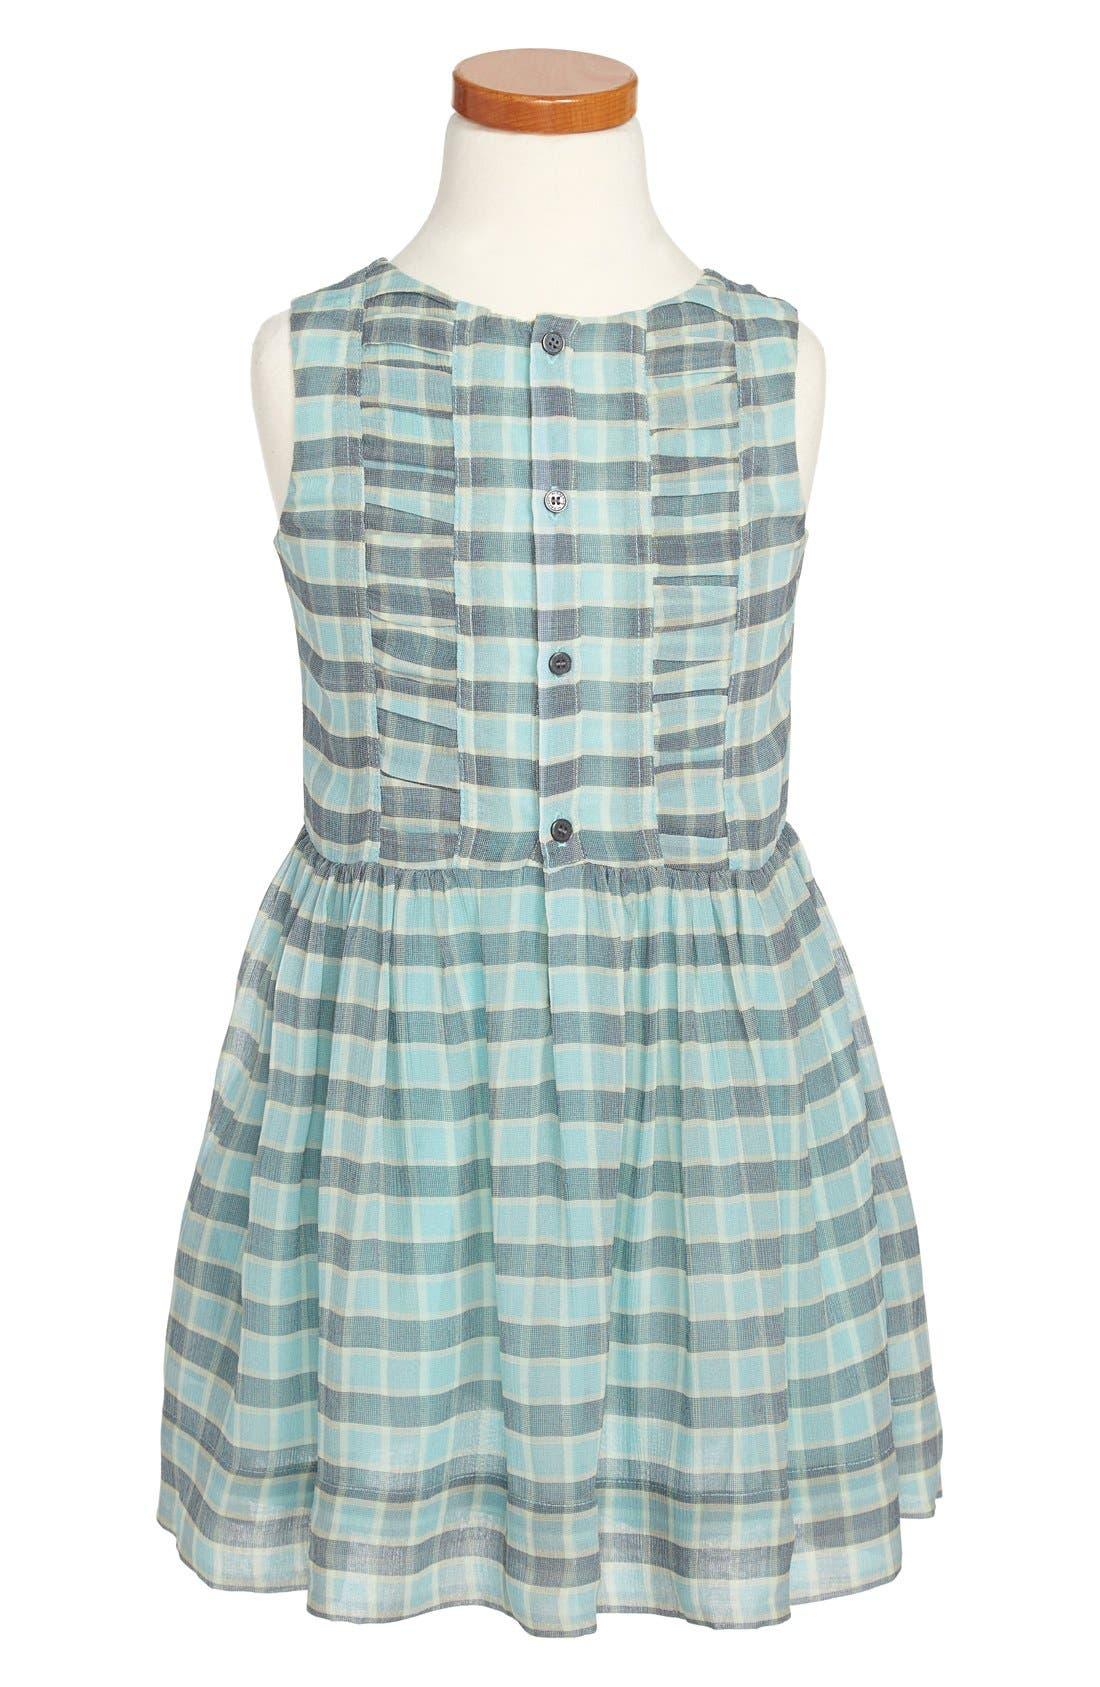 Alternate Image 1 Selected - Burberry Ruched Silk Dress (Little Girls & Big Girls)